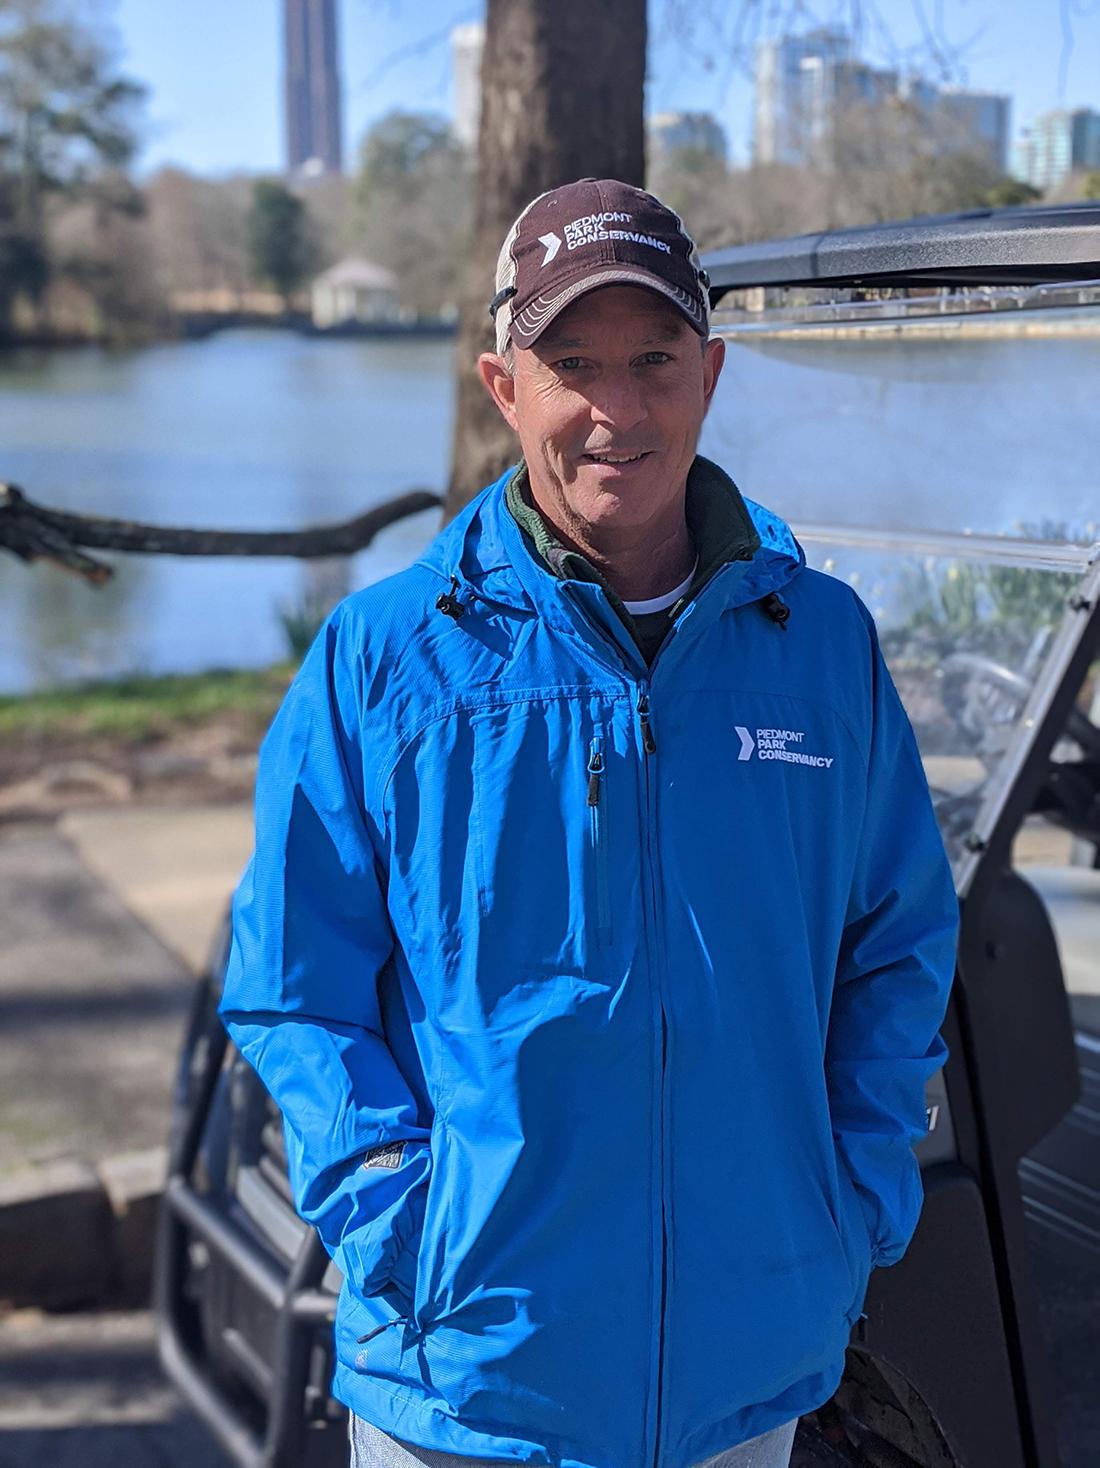 David Esslinger, Director of Operations at the Piedmont Park Convservancy.